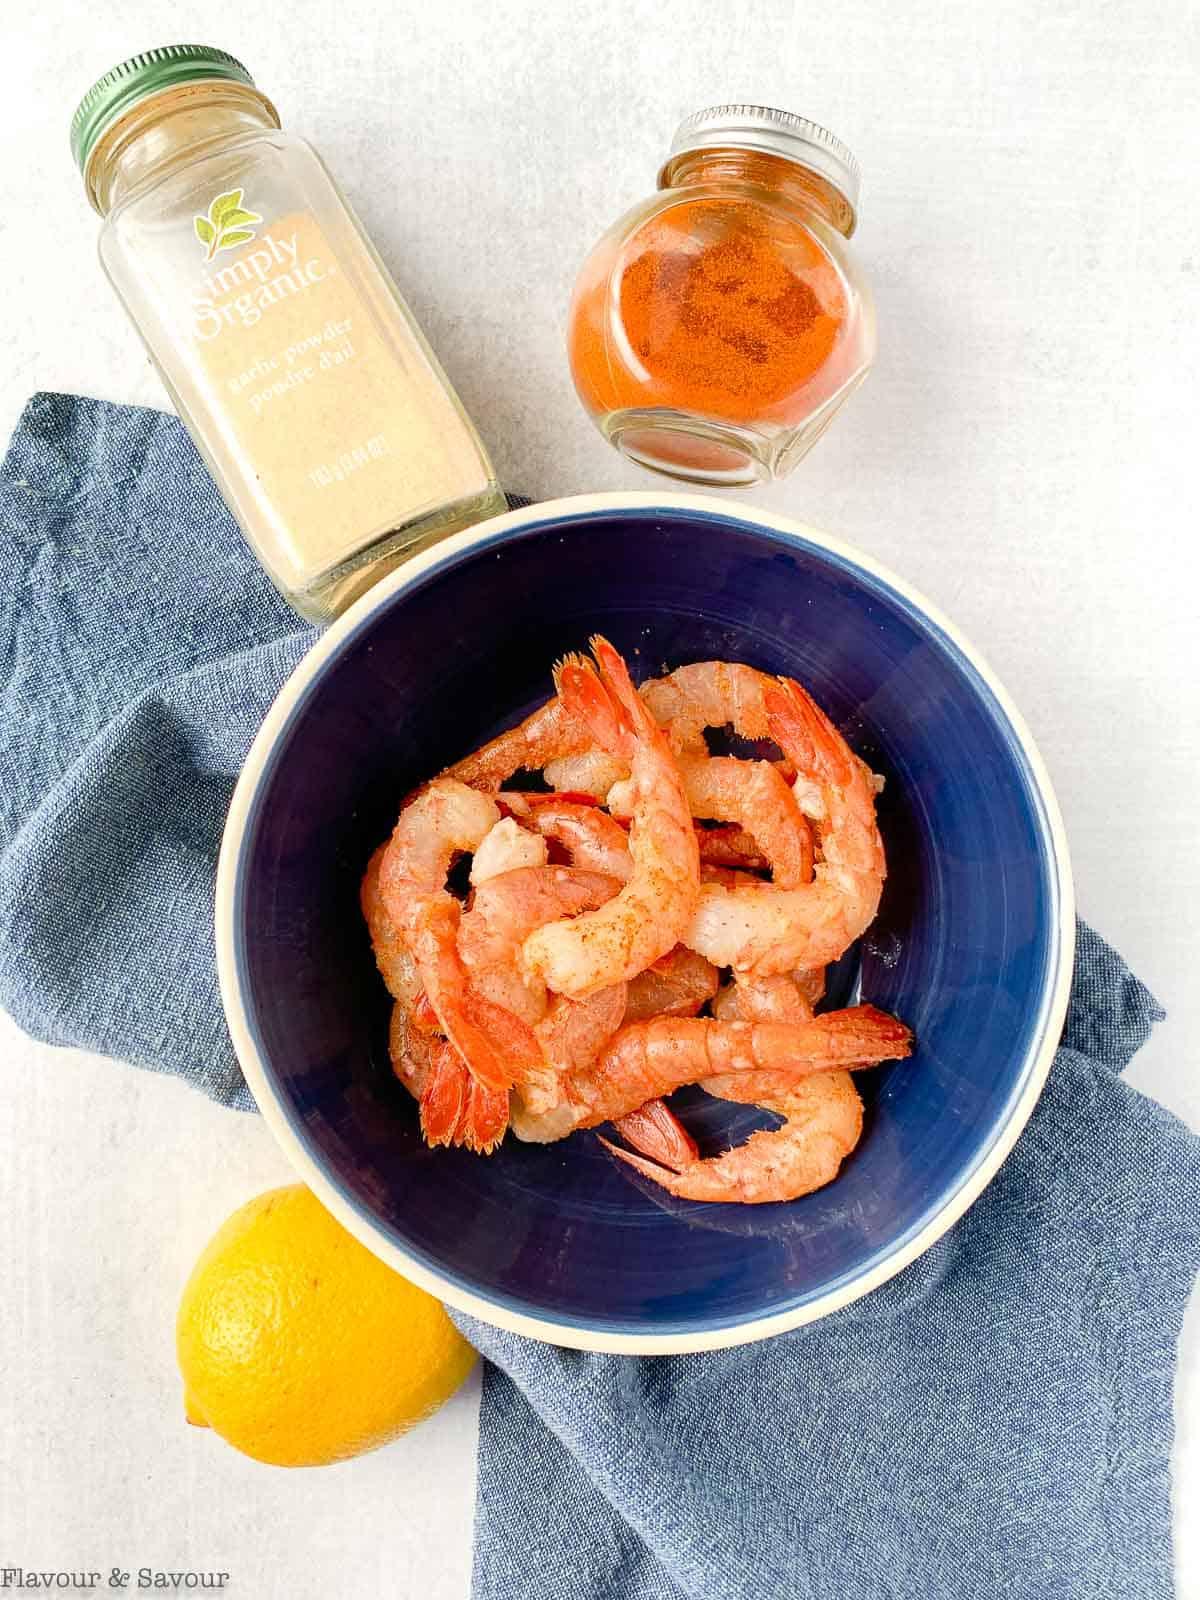 Ingredients for Air Fryer Lemon Garlic Shrimp